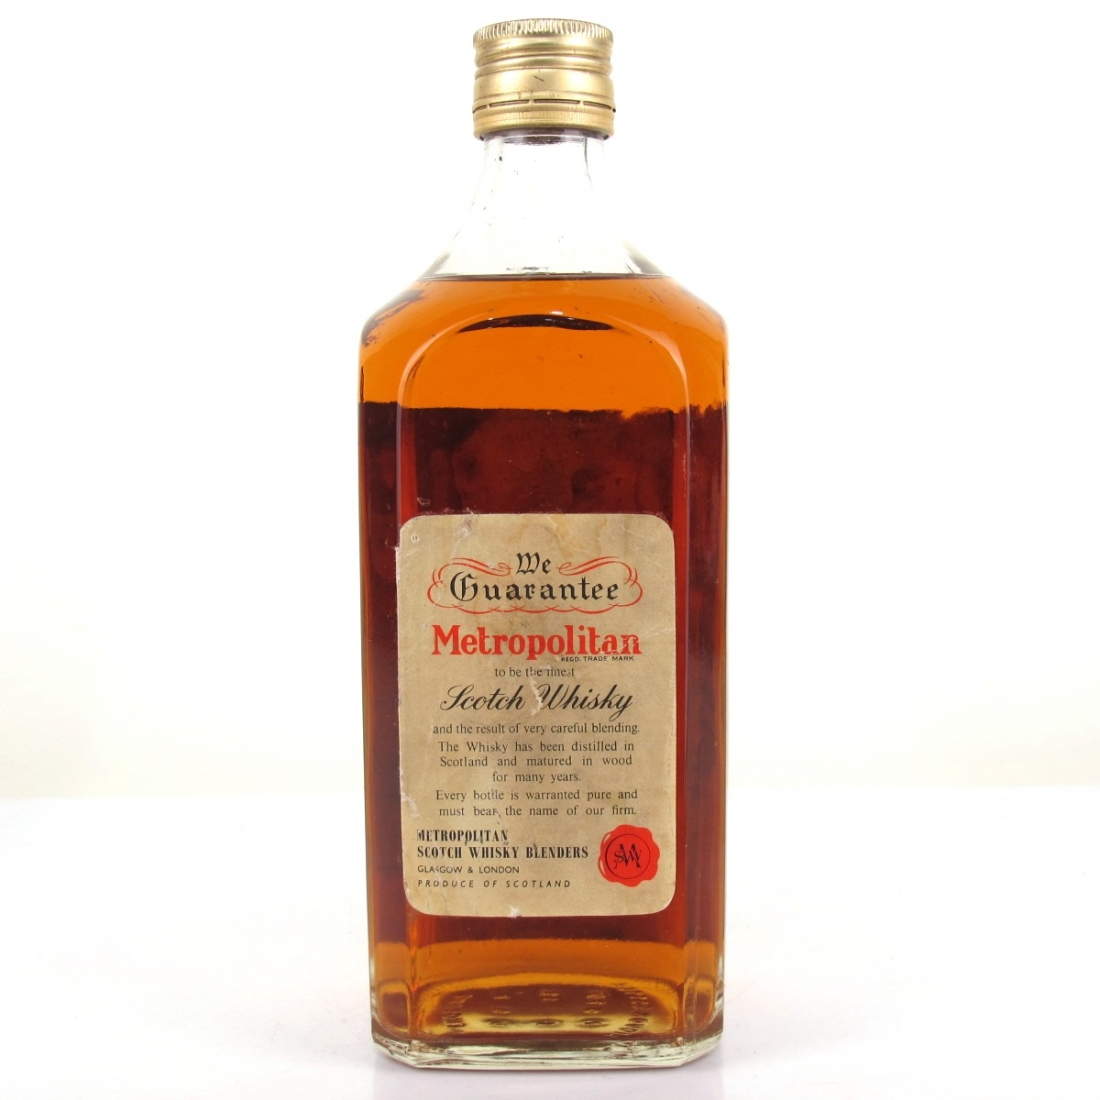 Metropolitan 5 Year Old De Luxe Scotch Whisky 1960s